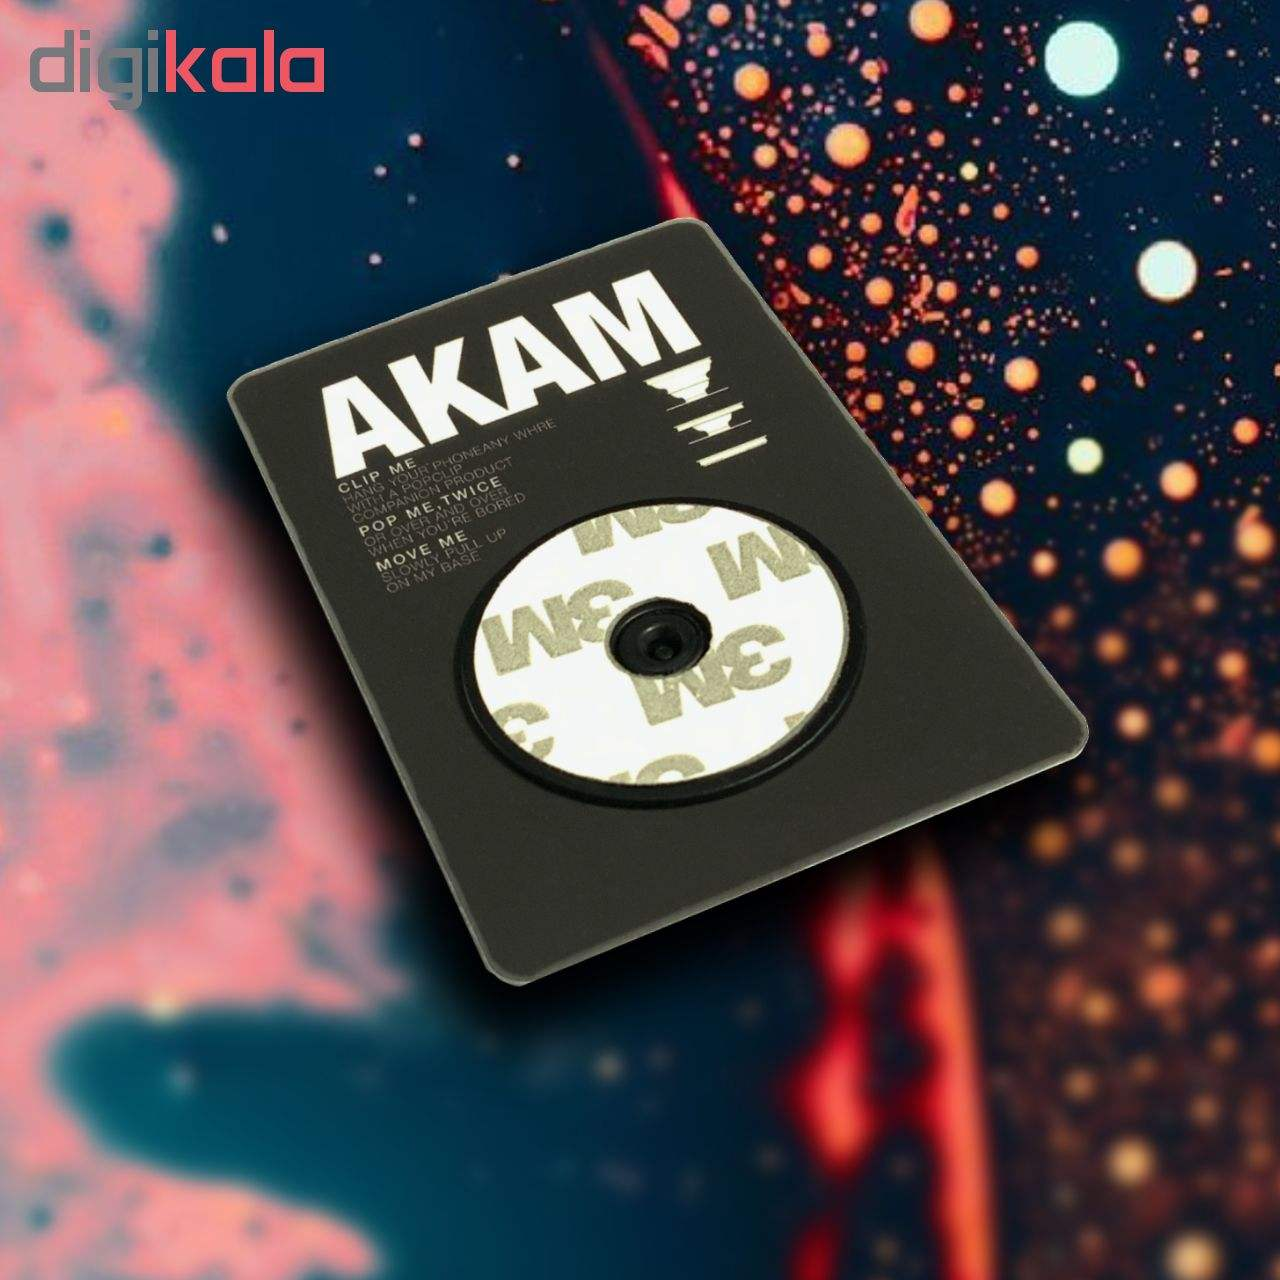 پایه نگهدارنده گوشی موبایل پاپ سوکت آکام مدل APS0163 main 1 2